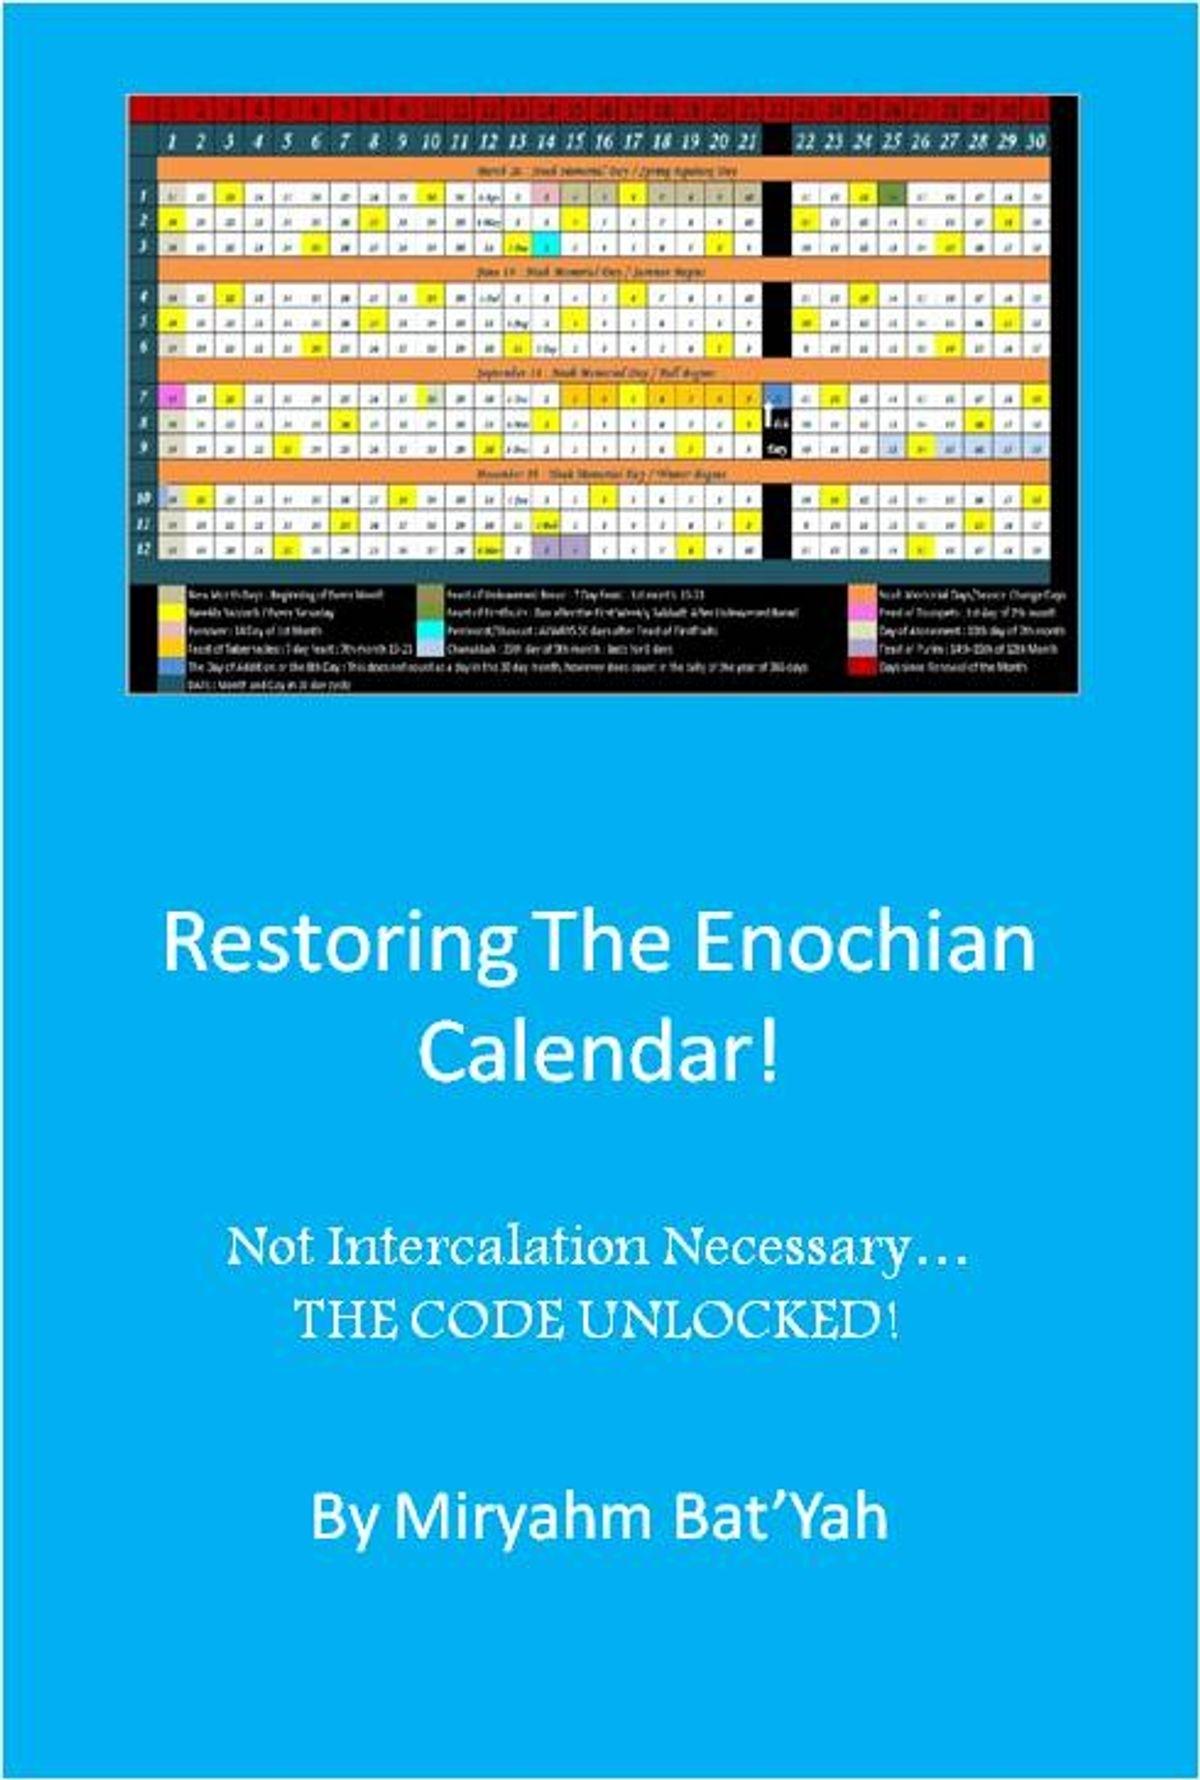 Restoring The Enoch Calendar With No Intercalation Ebookmiryahm Bat'Yah  - Rakuten Kobo pertaining to Enoch Calendar Ancient Hebrew 2019